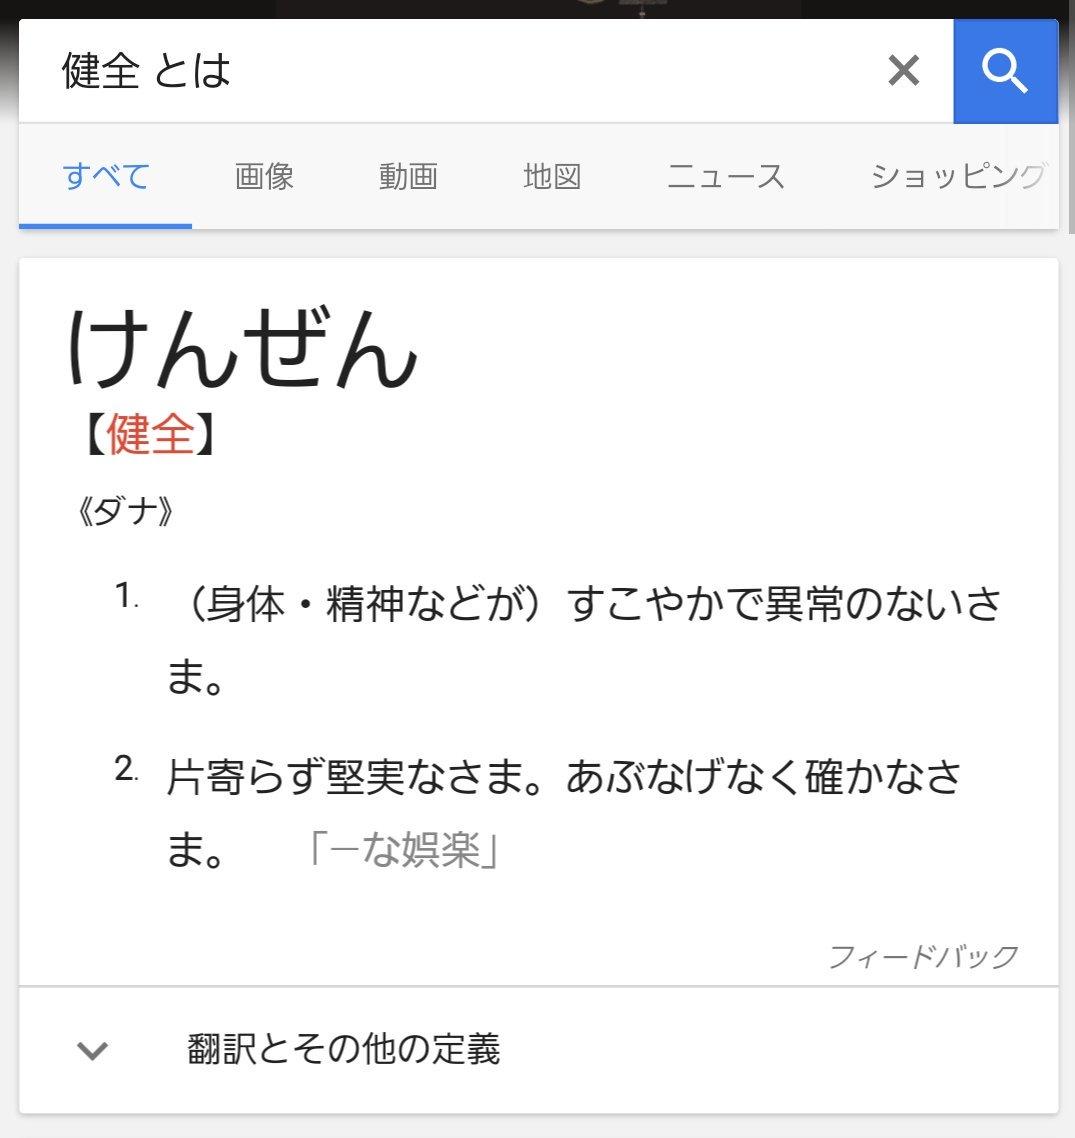 (っ\u0027ヮ\u0027c)健全とは・・・pic.twitter.com/ngH1OXUknZ